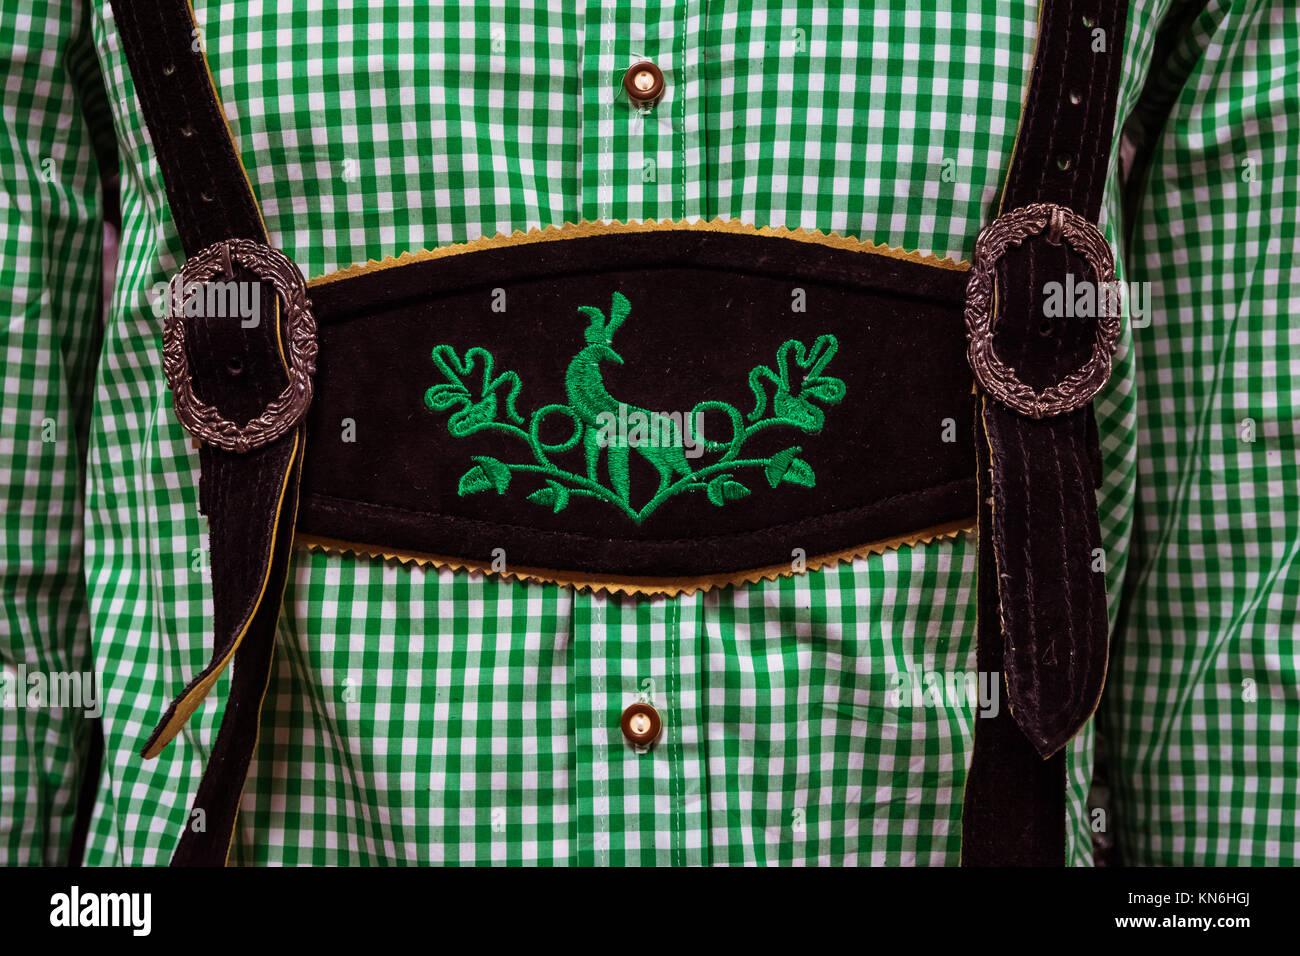 Traditional German Lederhosen Center Chestpiece Closeup Leather Plaid Dress Green White - Stock Image